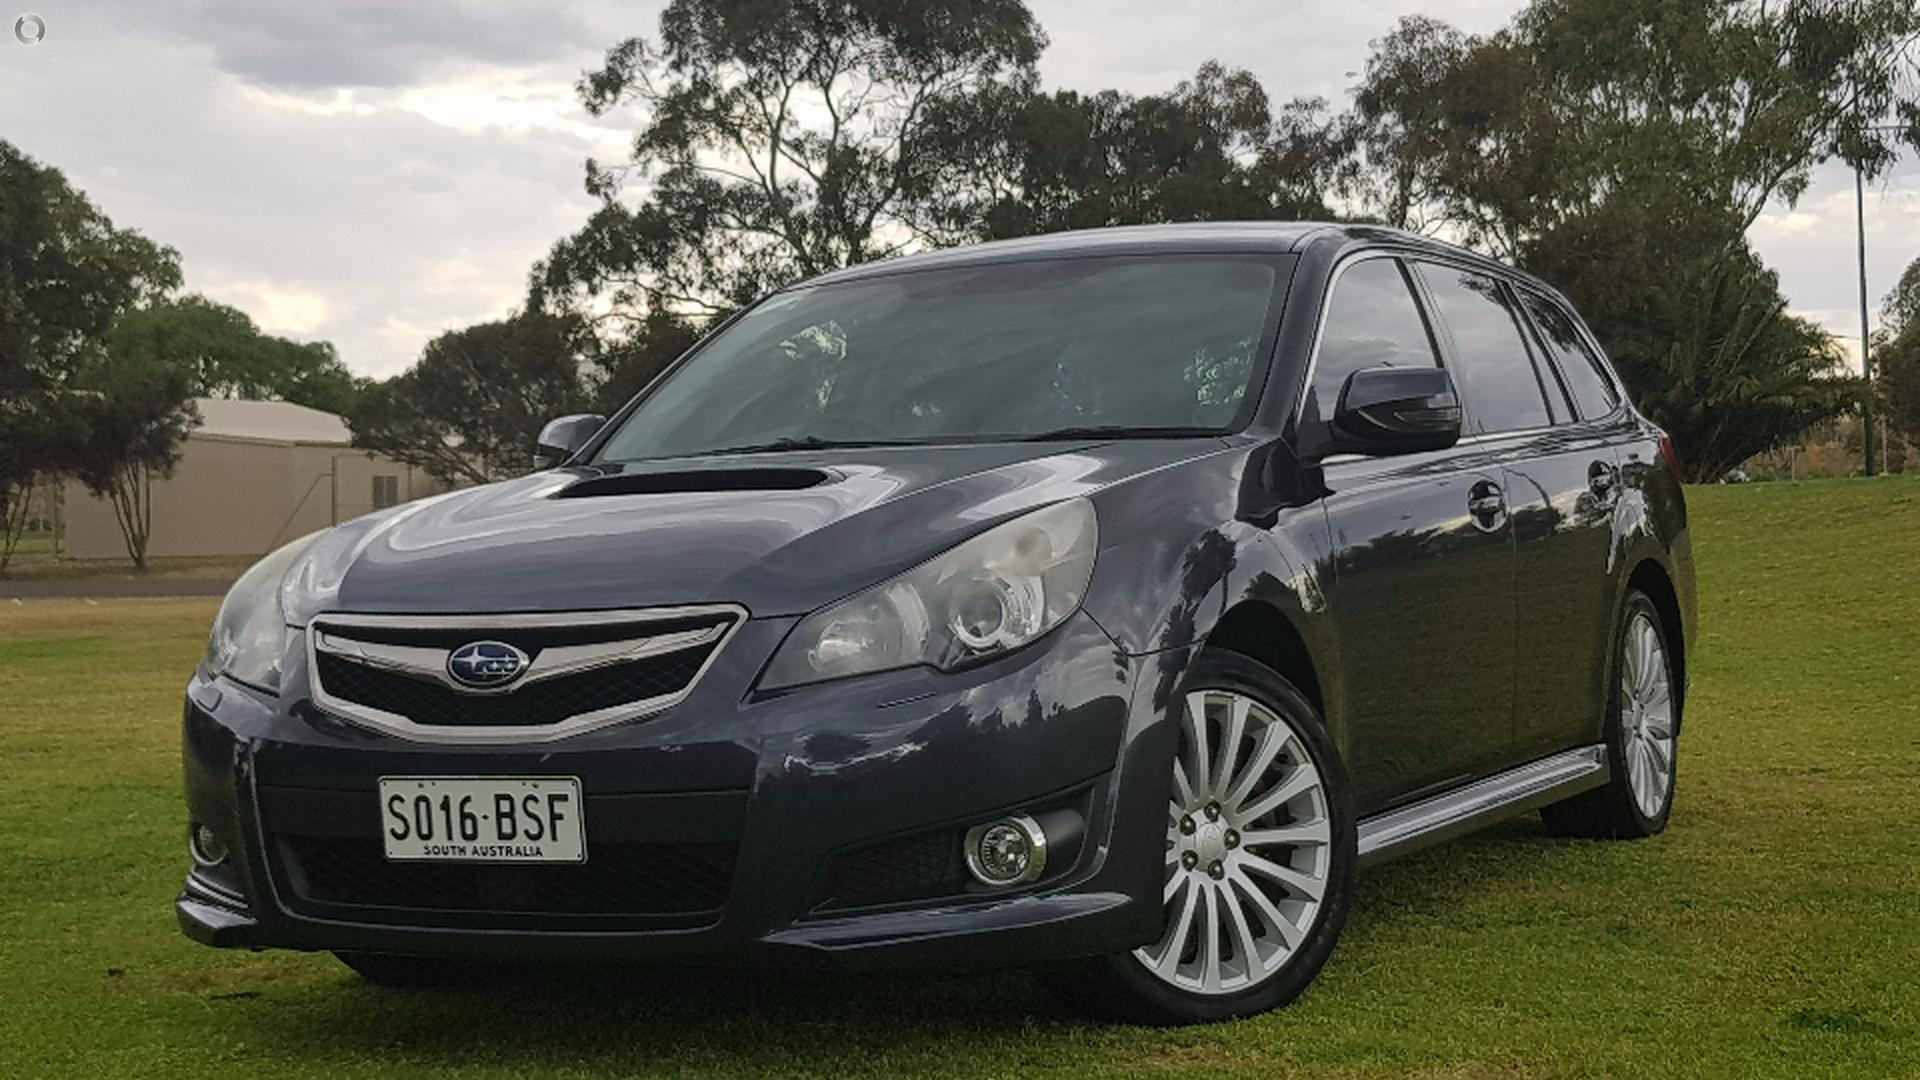 2010 Subaru Liberty Gt Premium